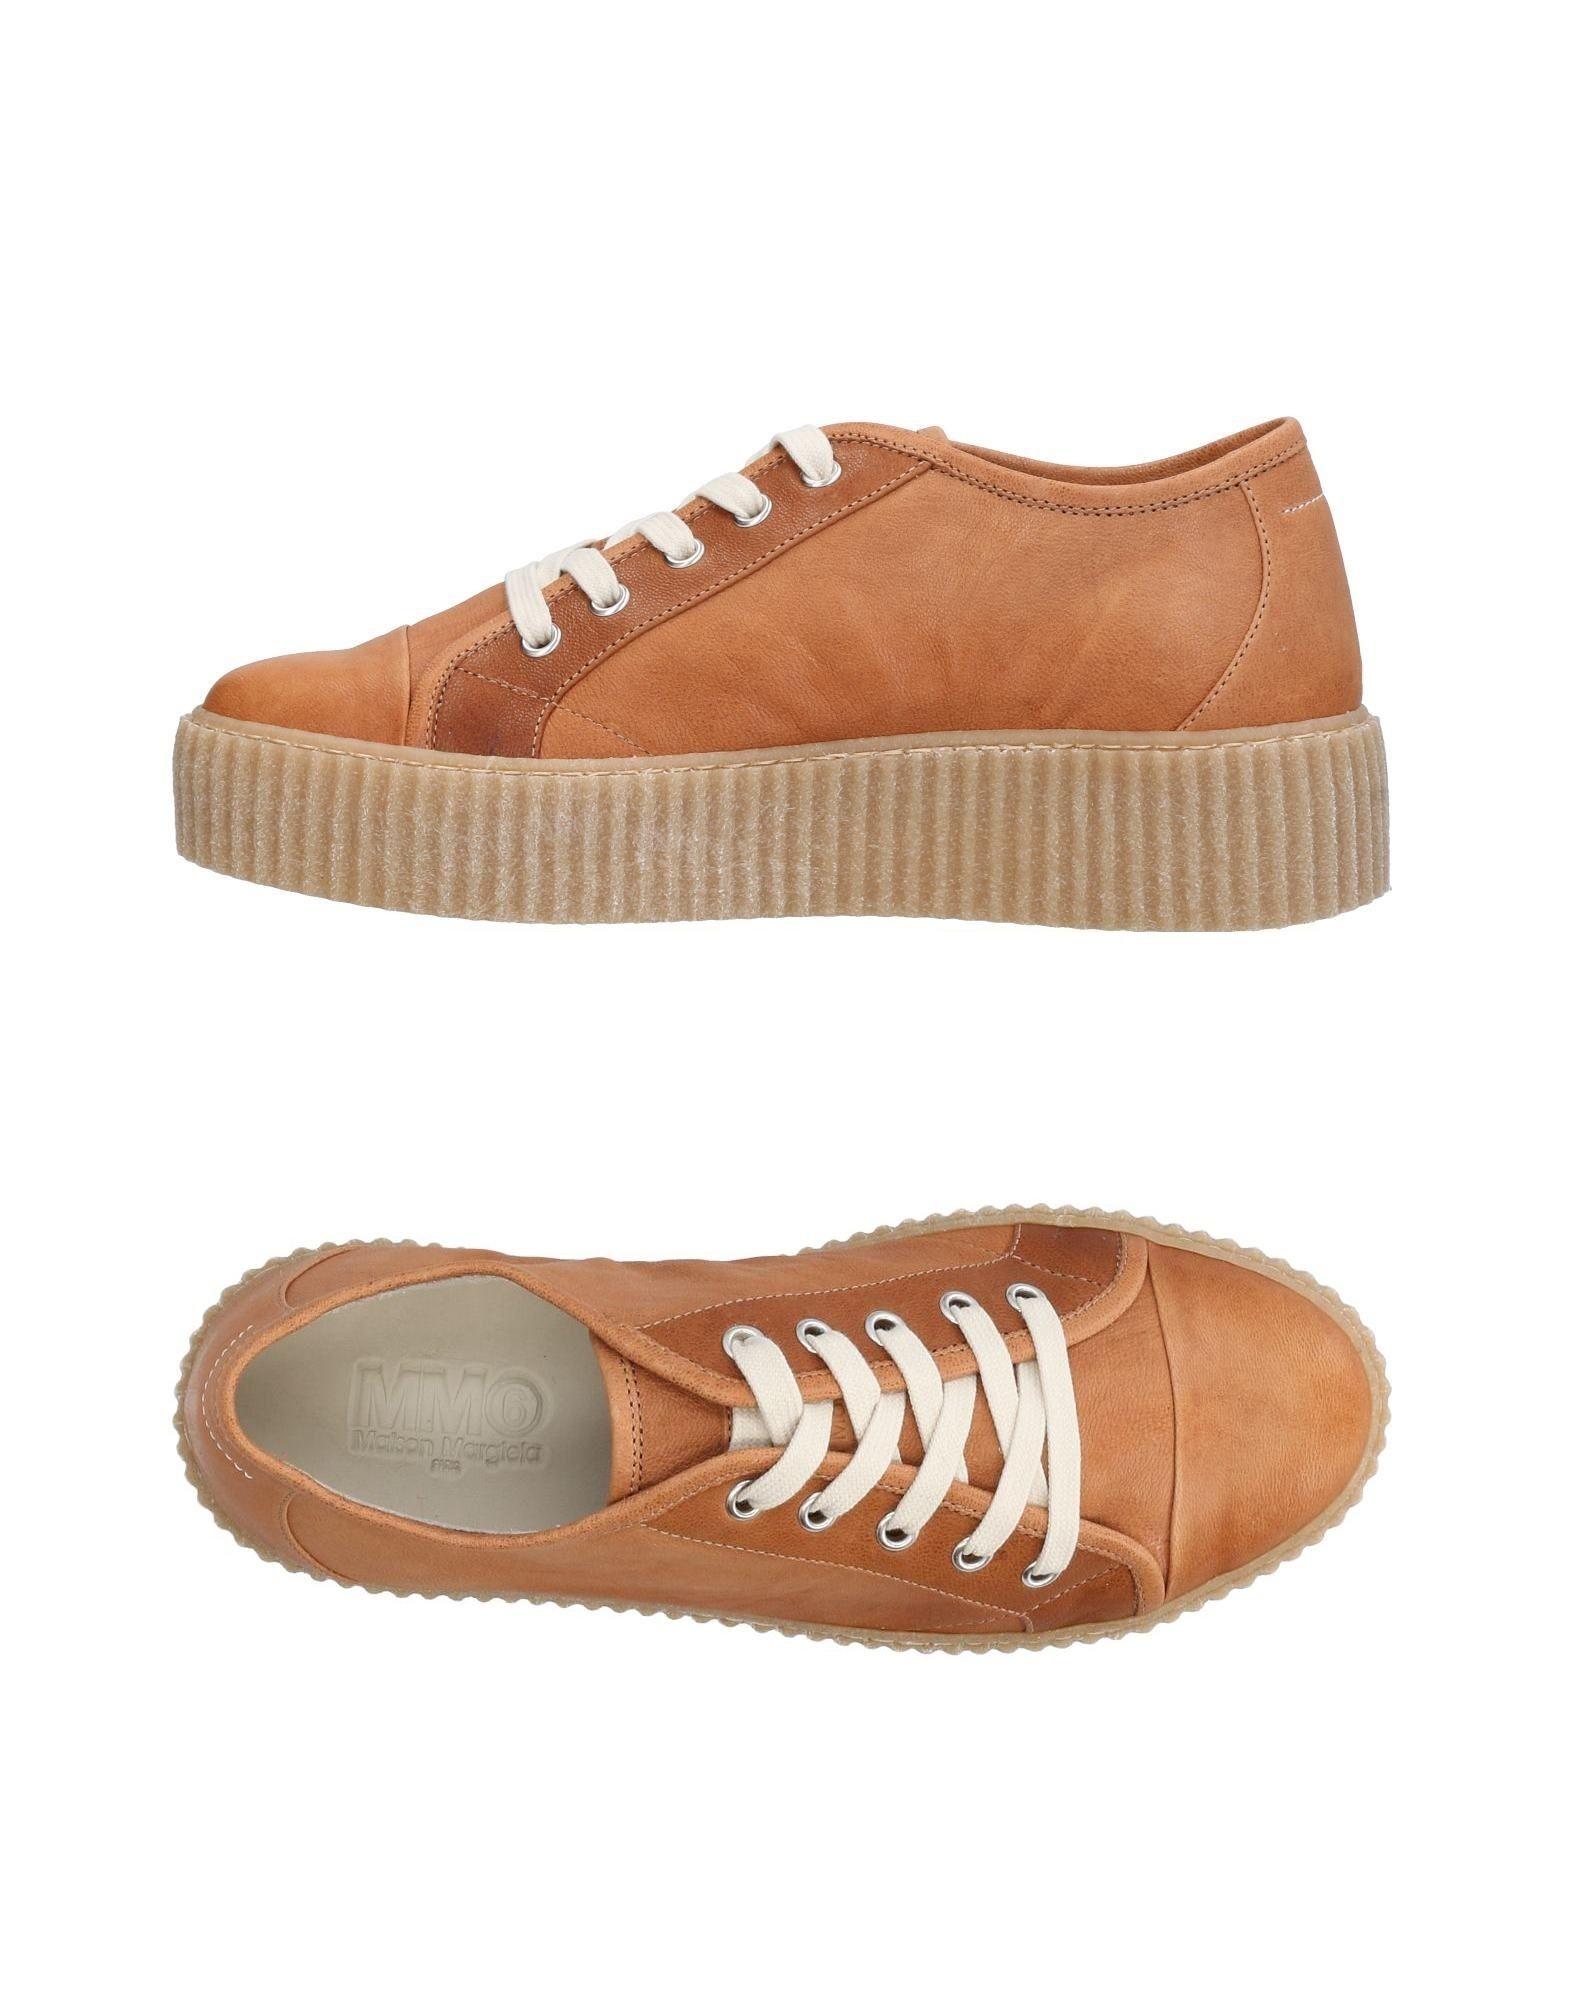 Mm6 Maison Margiela Sneakers Damen  11439860BSGut aussehende strapazierfähige Schuhe